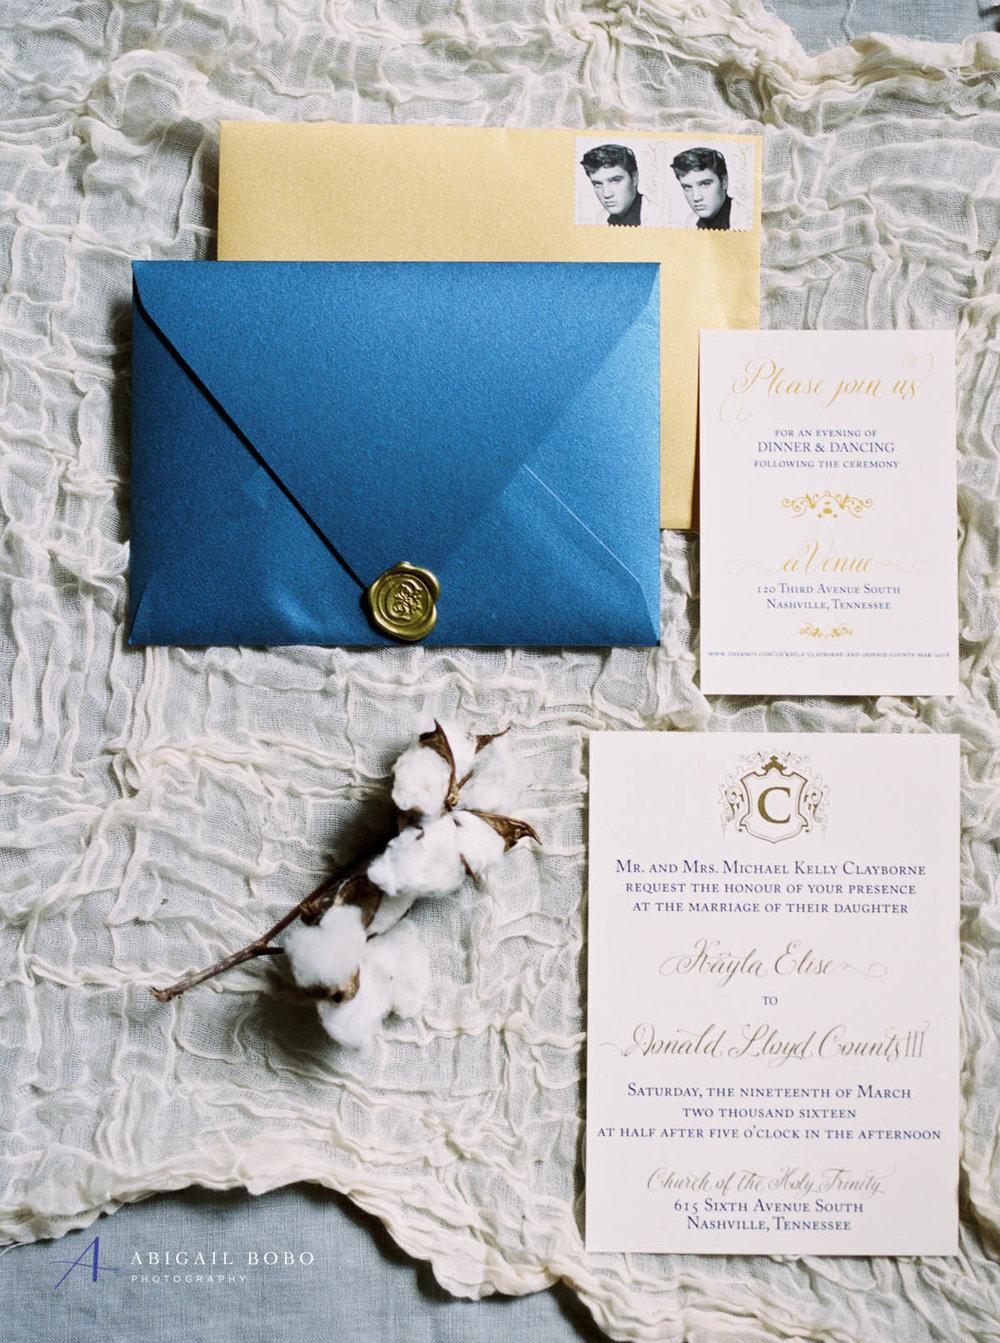 WEB_kayla+donnie_vendor_images_avenue_downtown nashville memphis inspired wedding ©2016abigailbobophotography-1.jpg